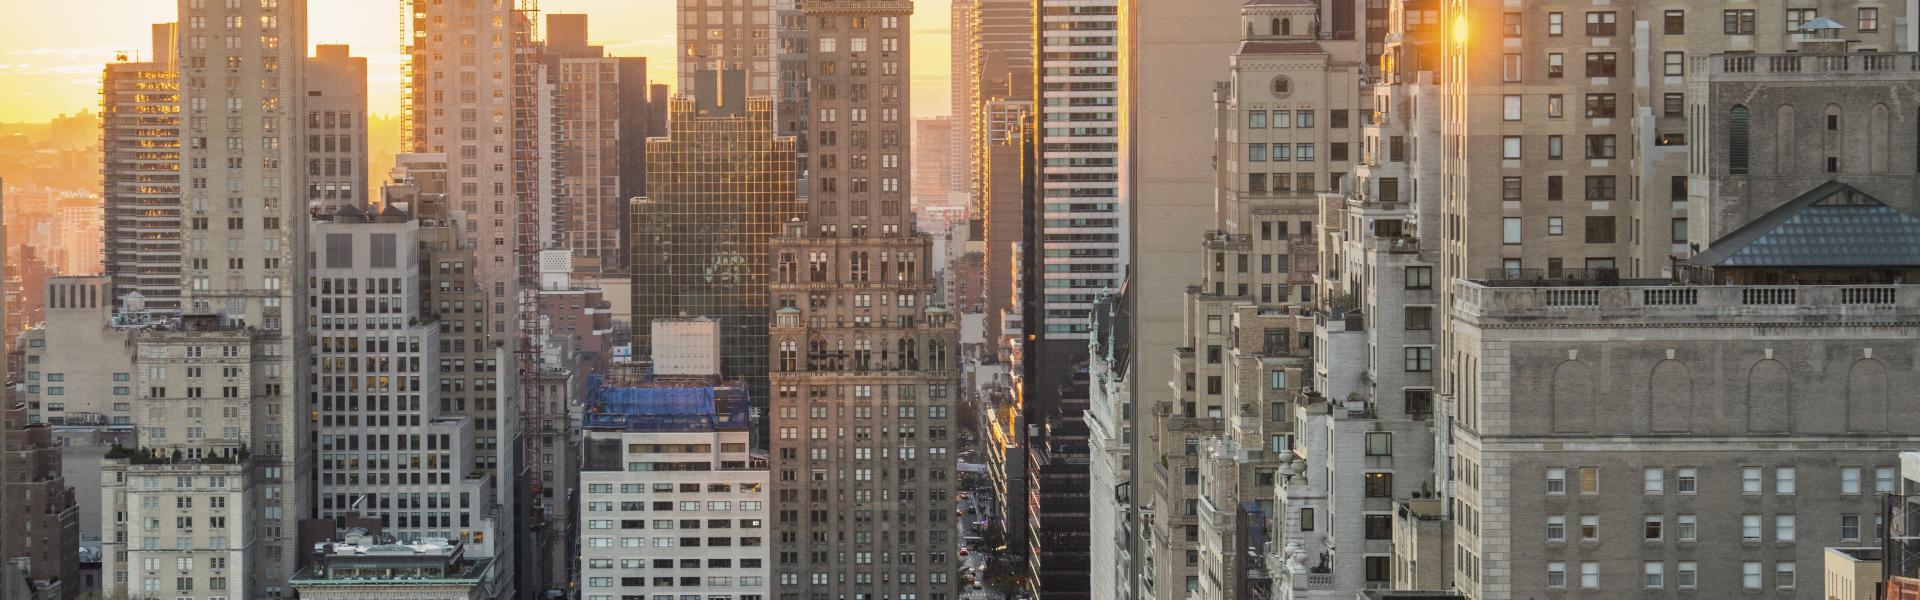 Mandarin Oriental, Manhattan, NYC, Julienne Schaer